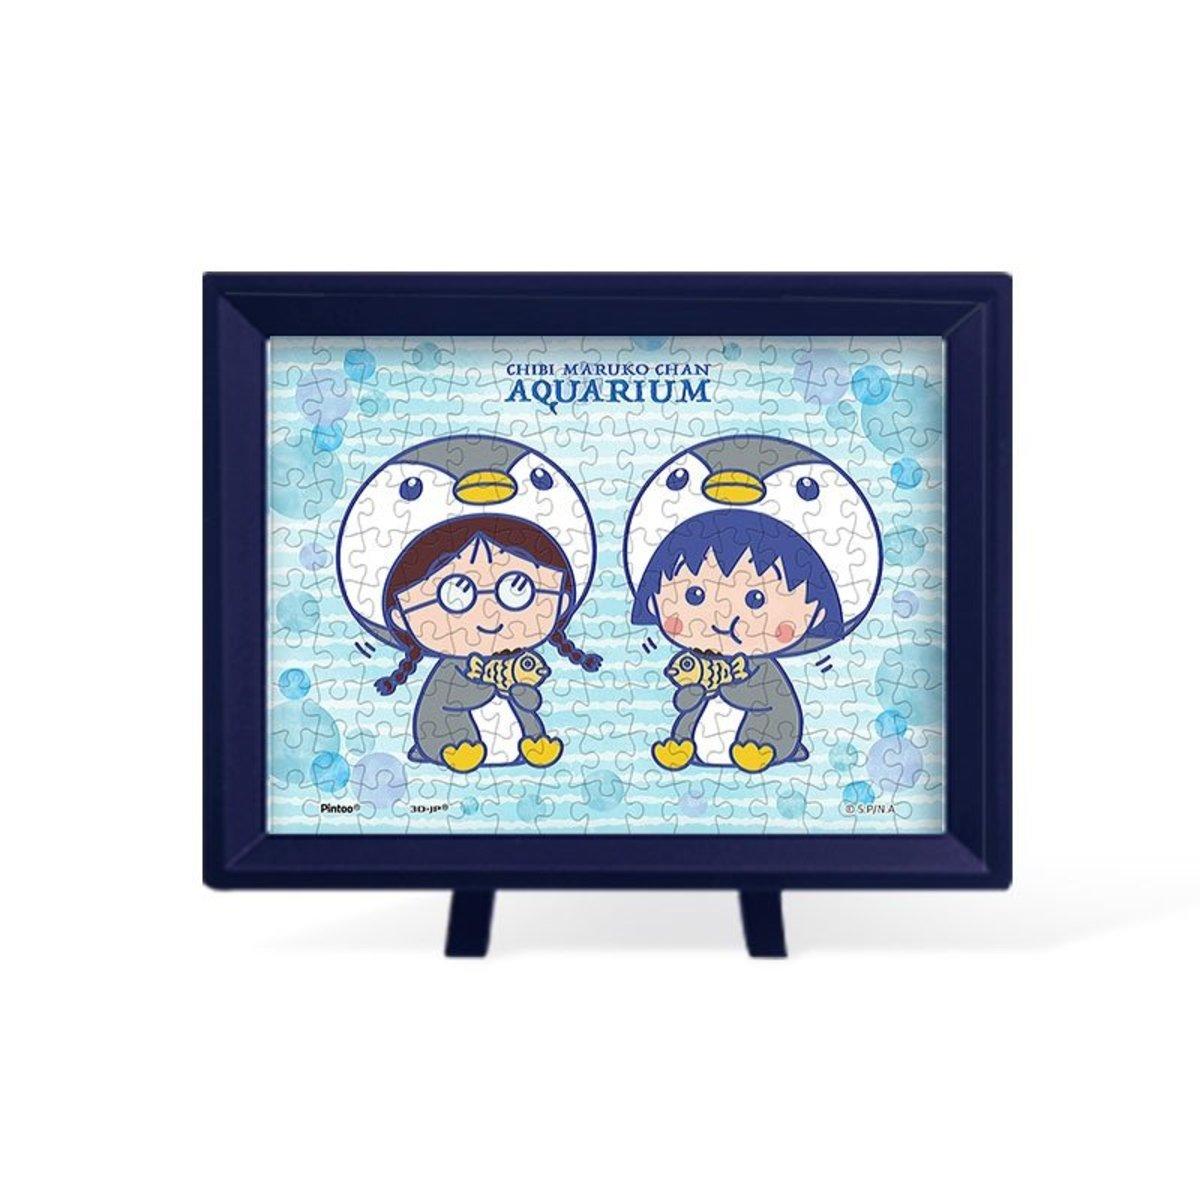 Chibi Maruko Chan - Cute Penguin Style